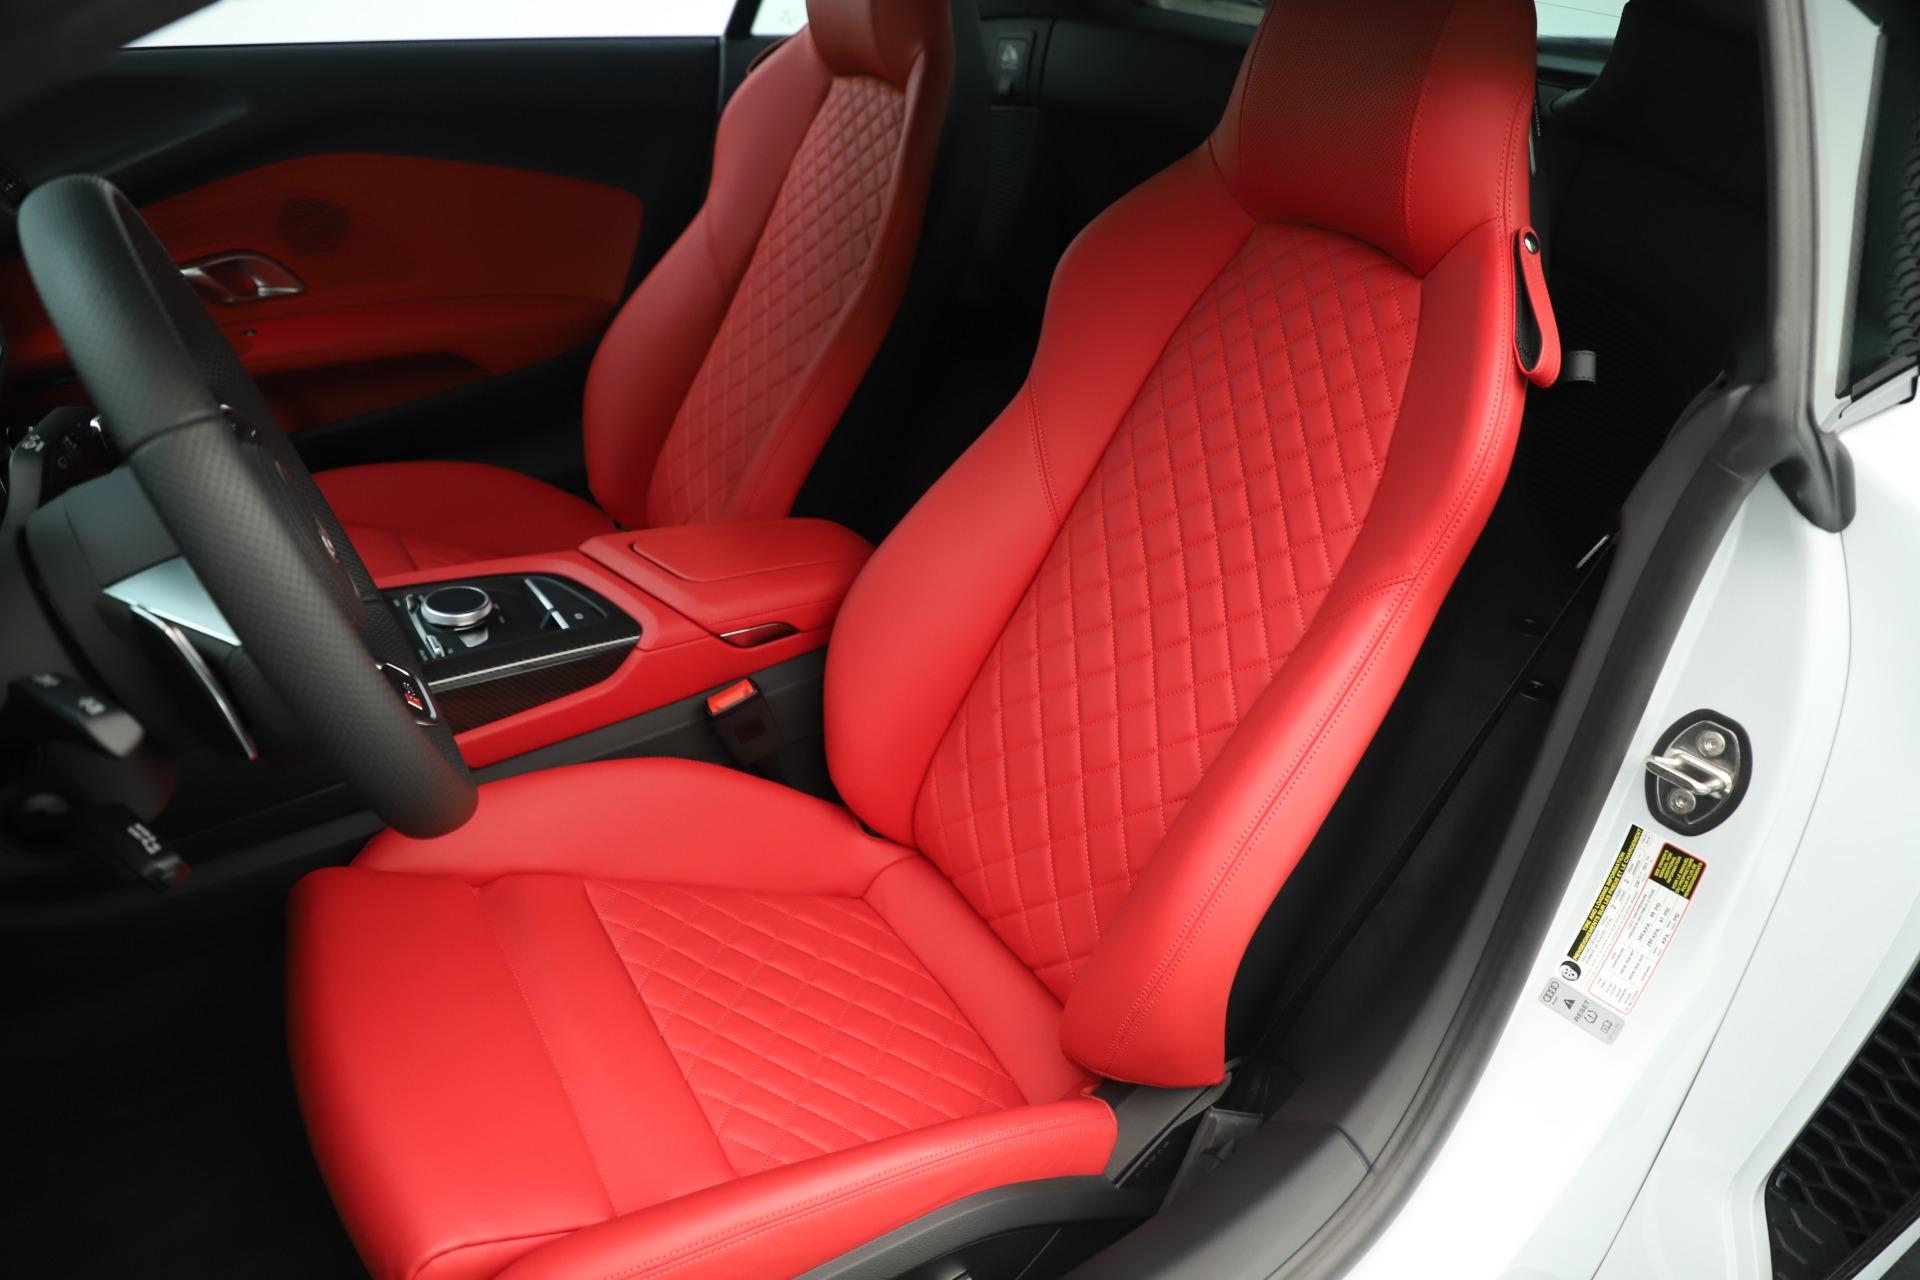 Used 2018 Audi R8 5.2 quattro V10 Plus For Sale In Greenwich, CT 3360_p16